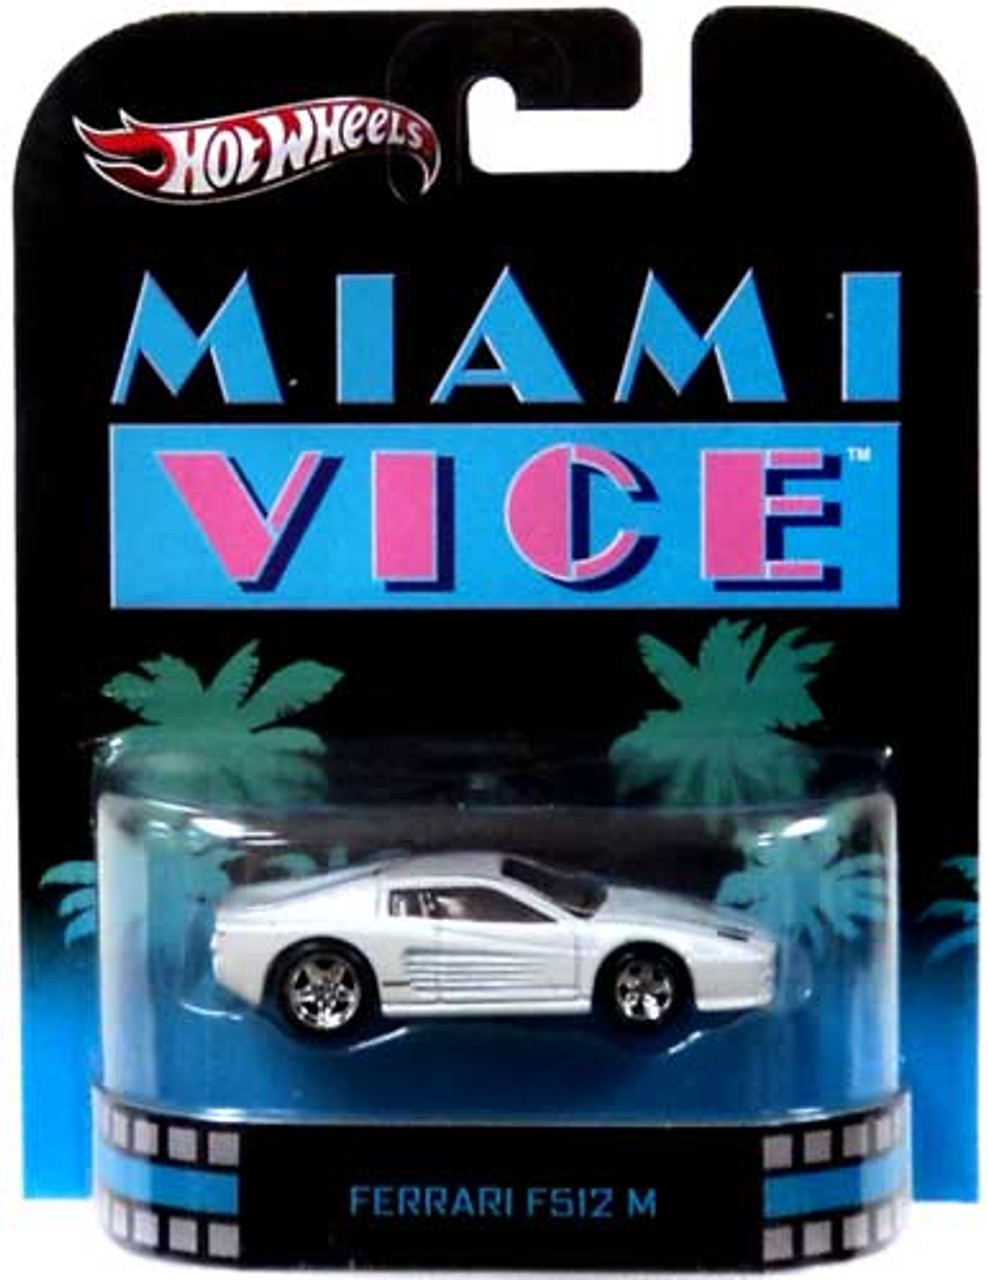 Miami Vice Hot Wheels Retro Ferrari F512 M Diecast Vehicle